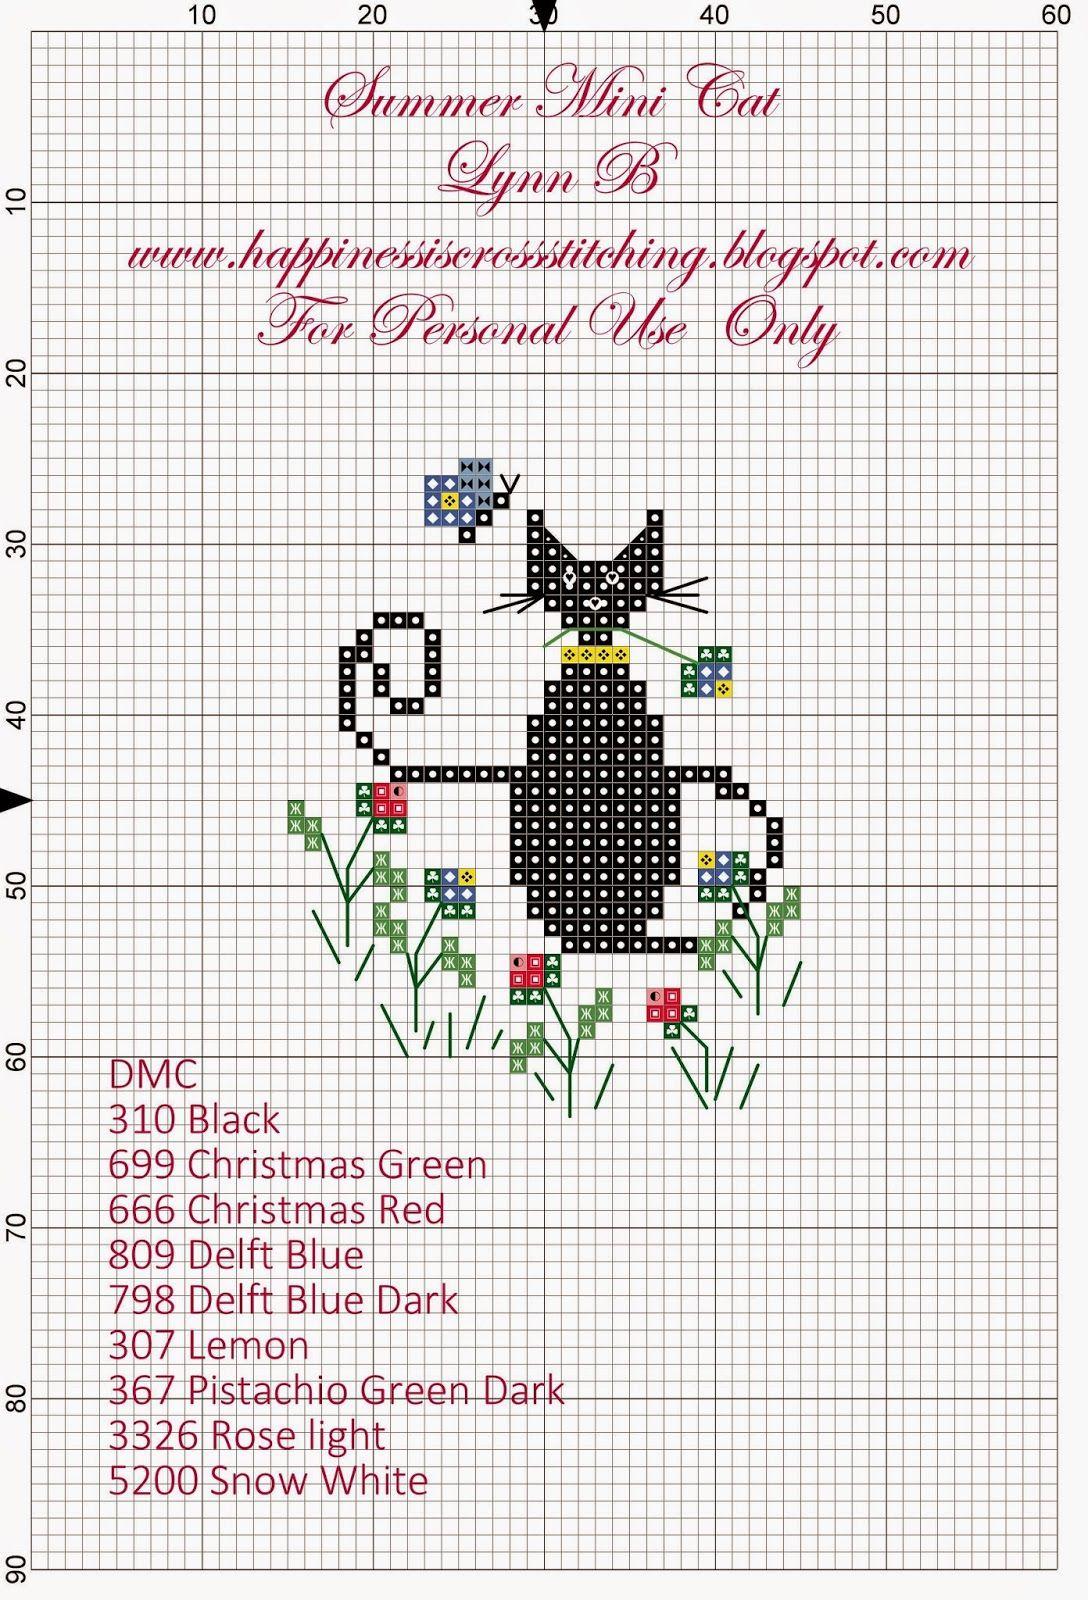 Free Mother's Day Cross Stitch Pattern and stitching